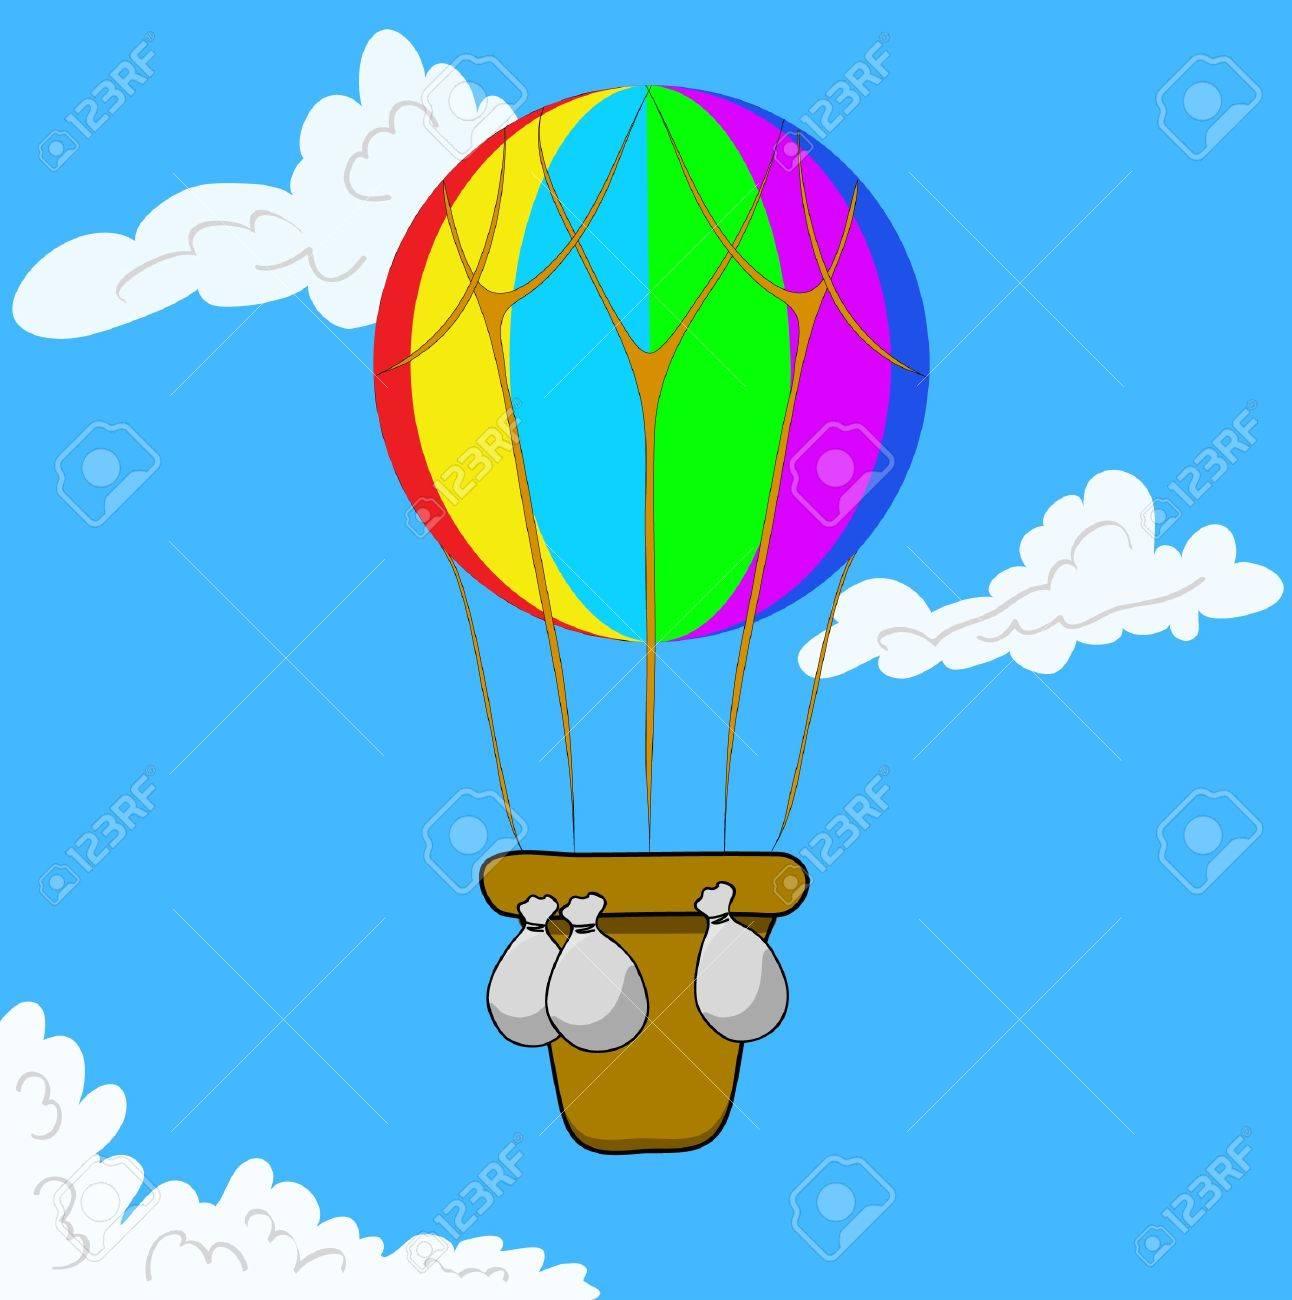 Multicolor Hot Air Balloon in blue sky. Vector illustration eps 10 Stock Vector - 9244066